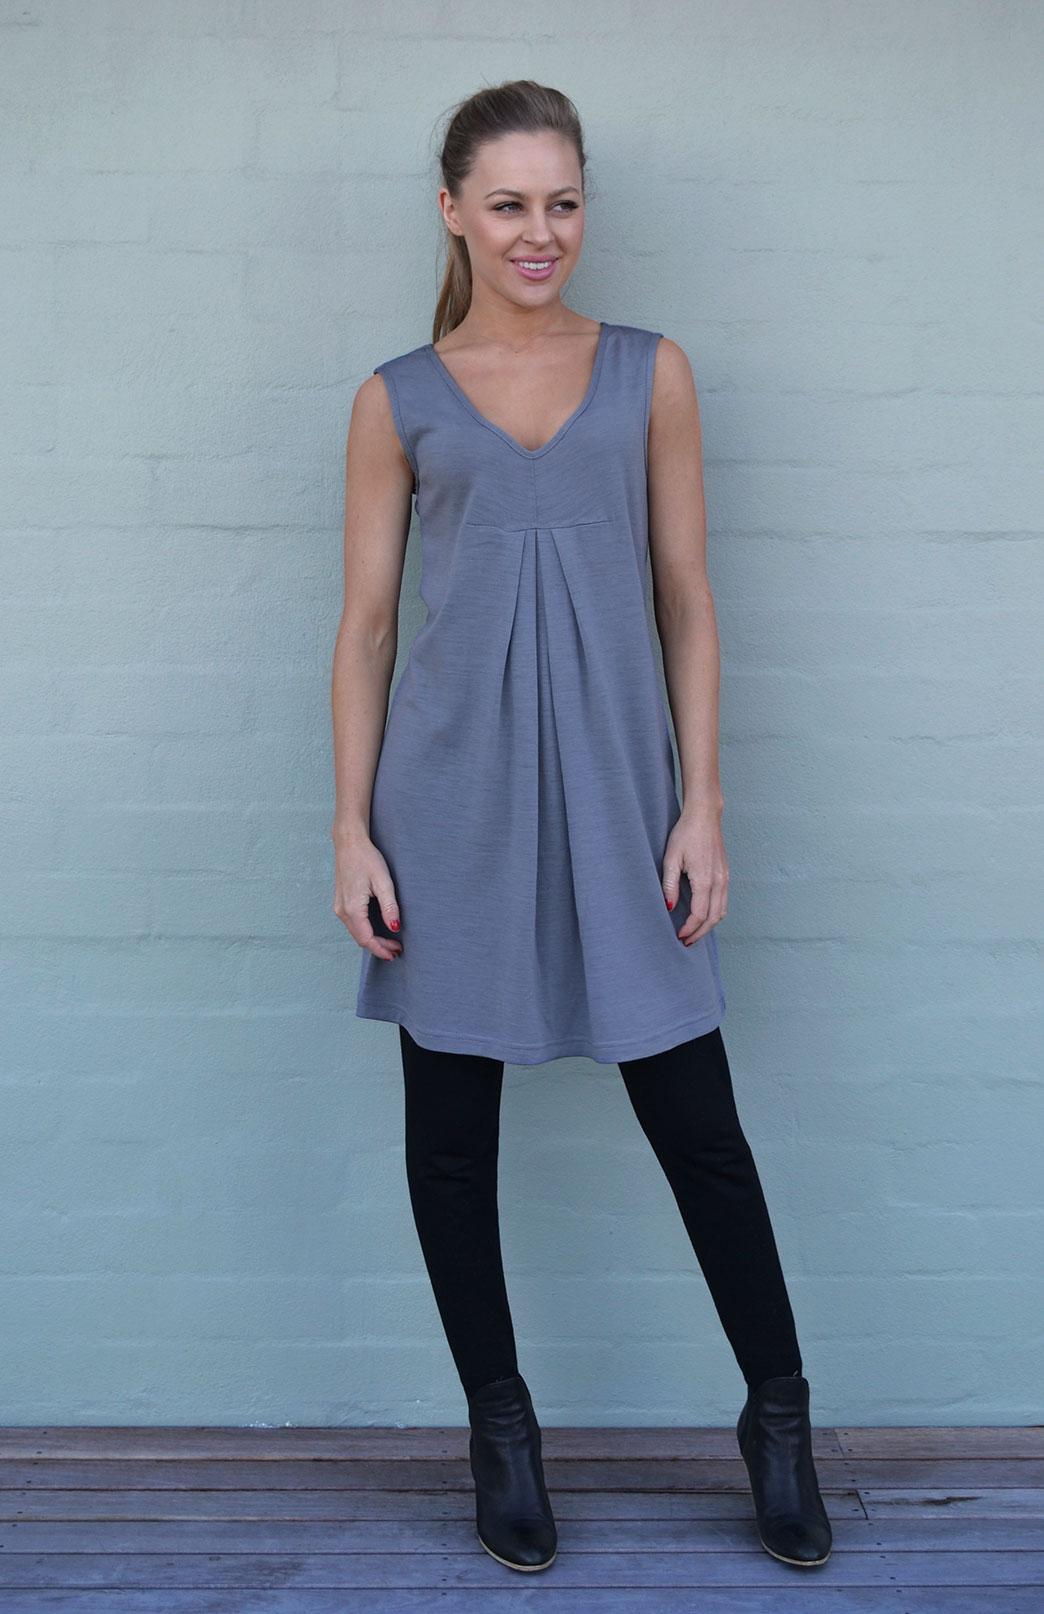 V-Front Dress - Women's Merino Wool Smoke Grey V-Neck Dress with Front Pleats - Smitten Merino Tasmania Australia